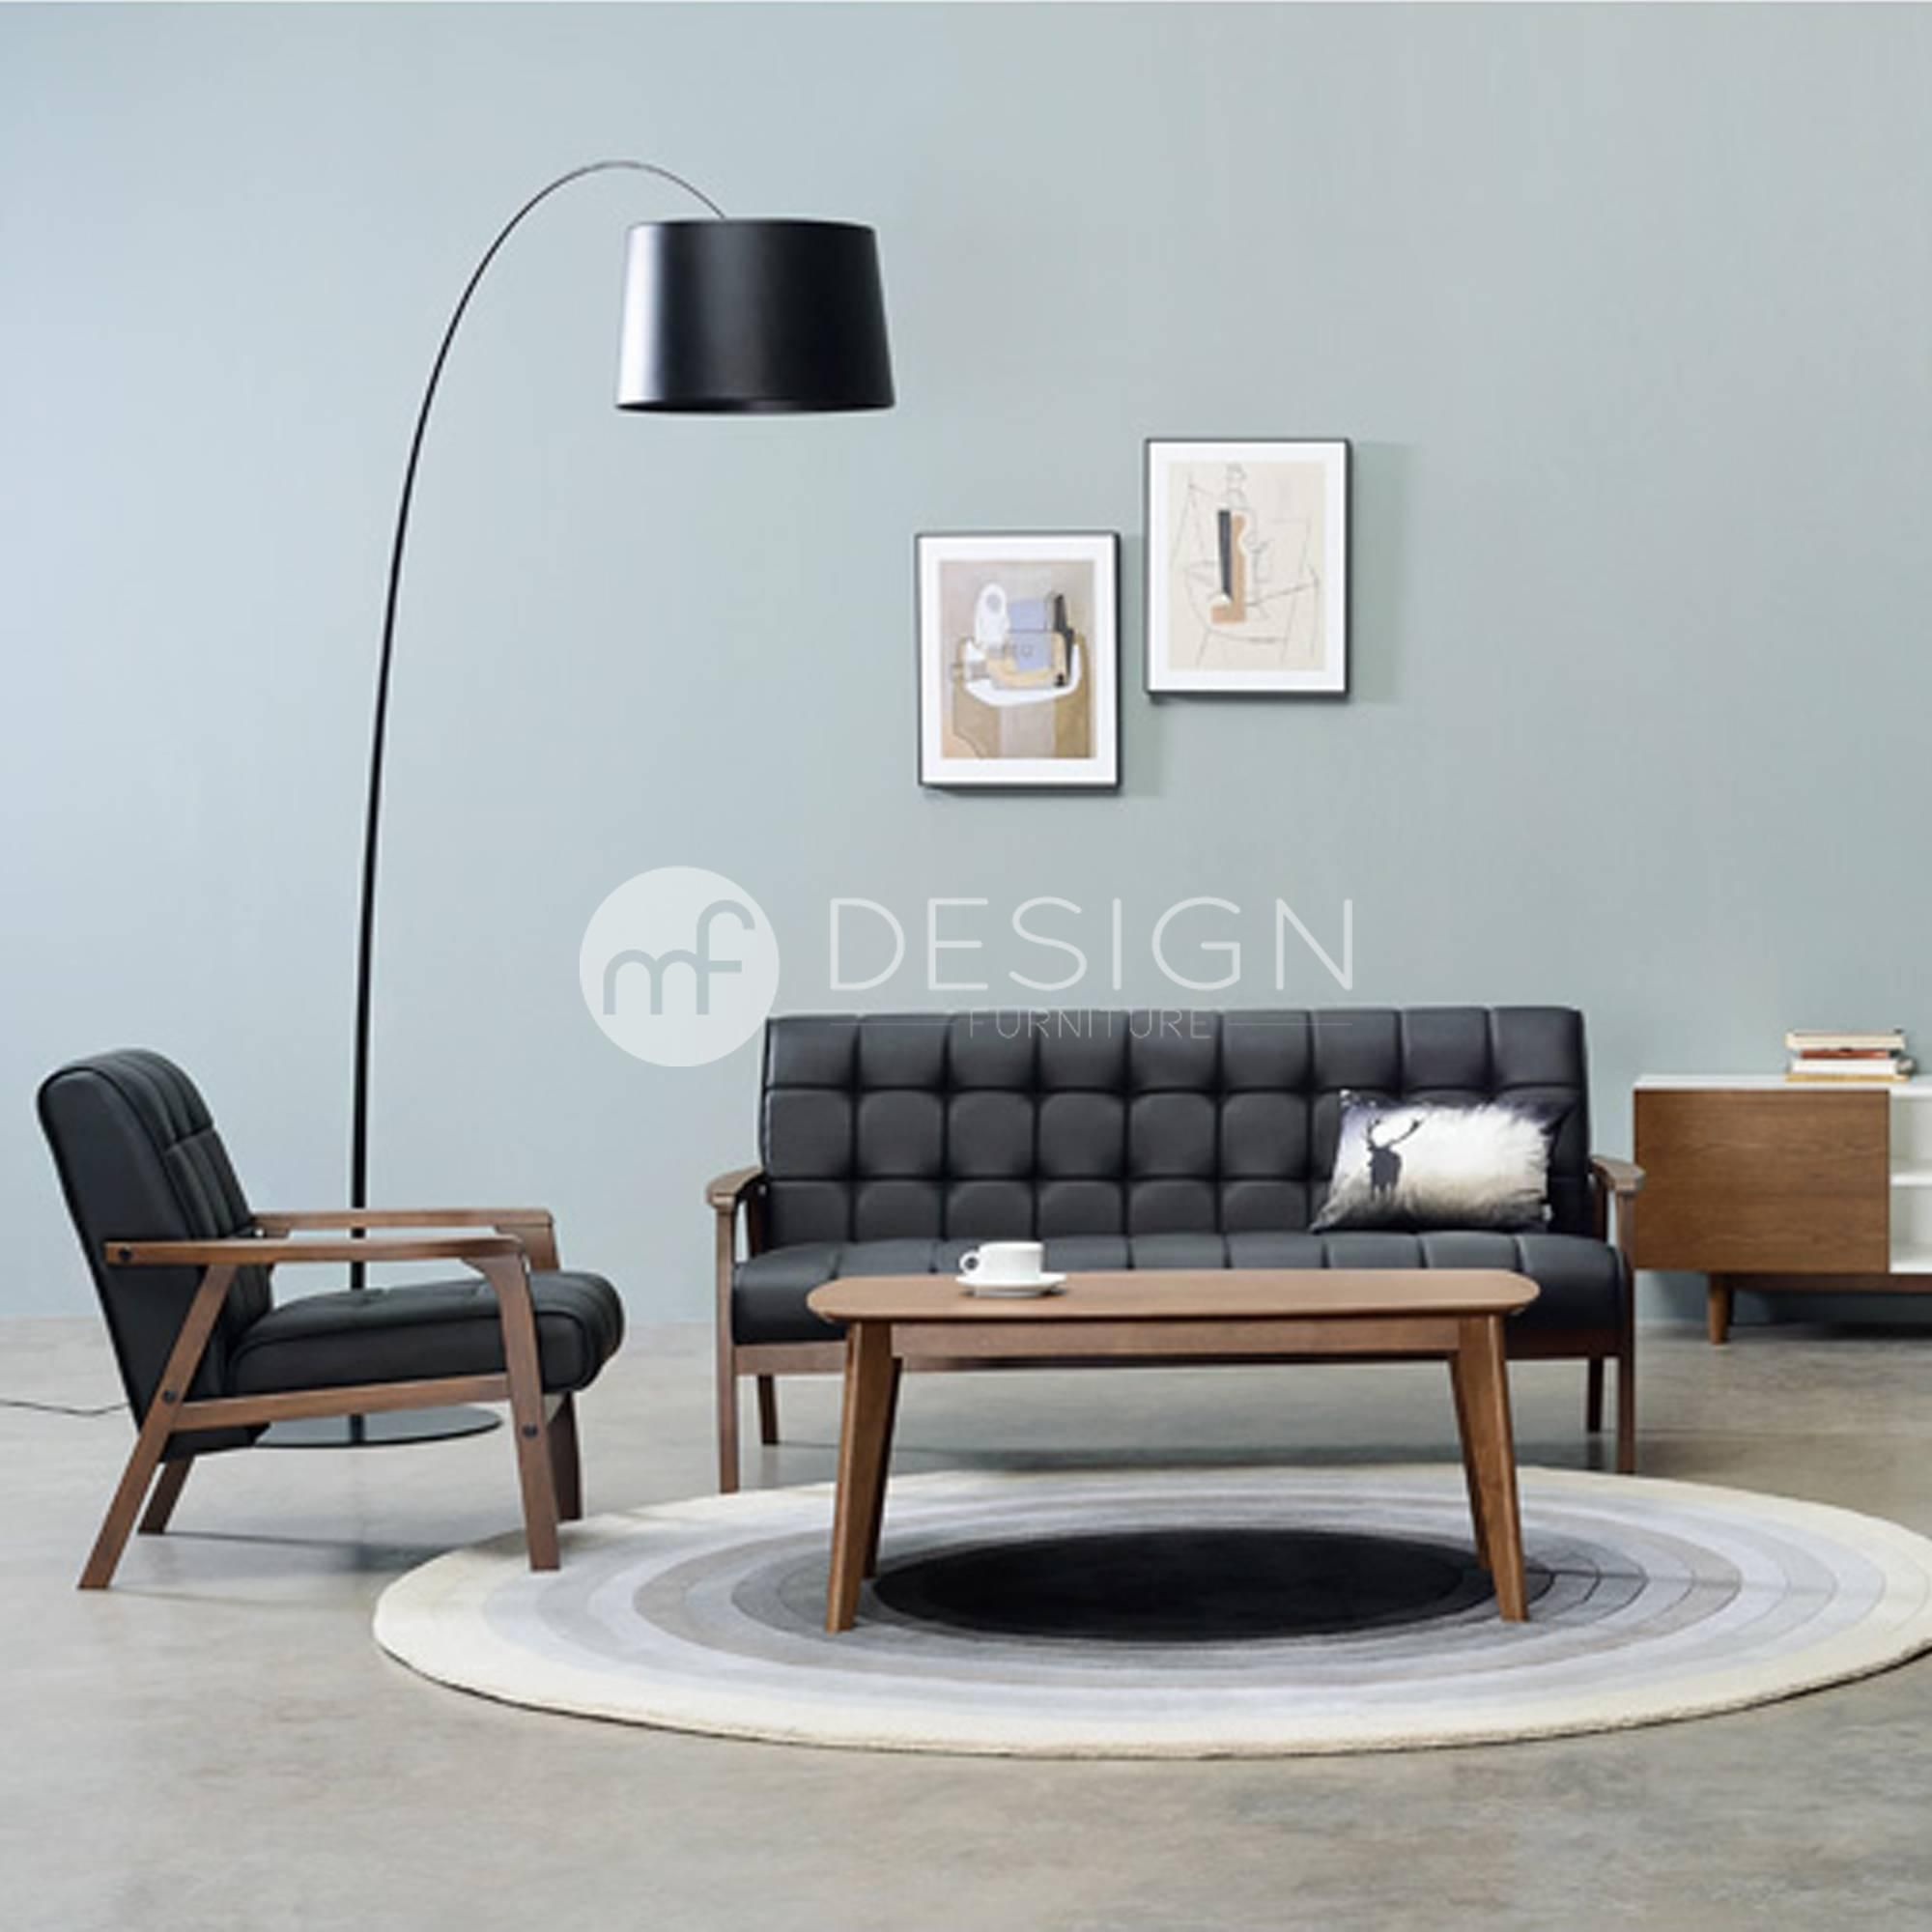 Sofa Scandinavian Murah Malaysia What Cleans Microfiber Sweden Ii Antique Espresso 1 432 433 43table Set Mf